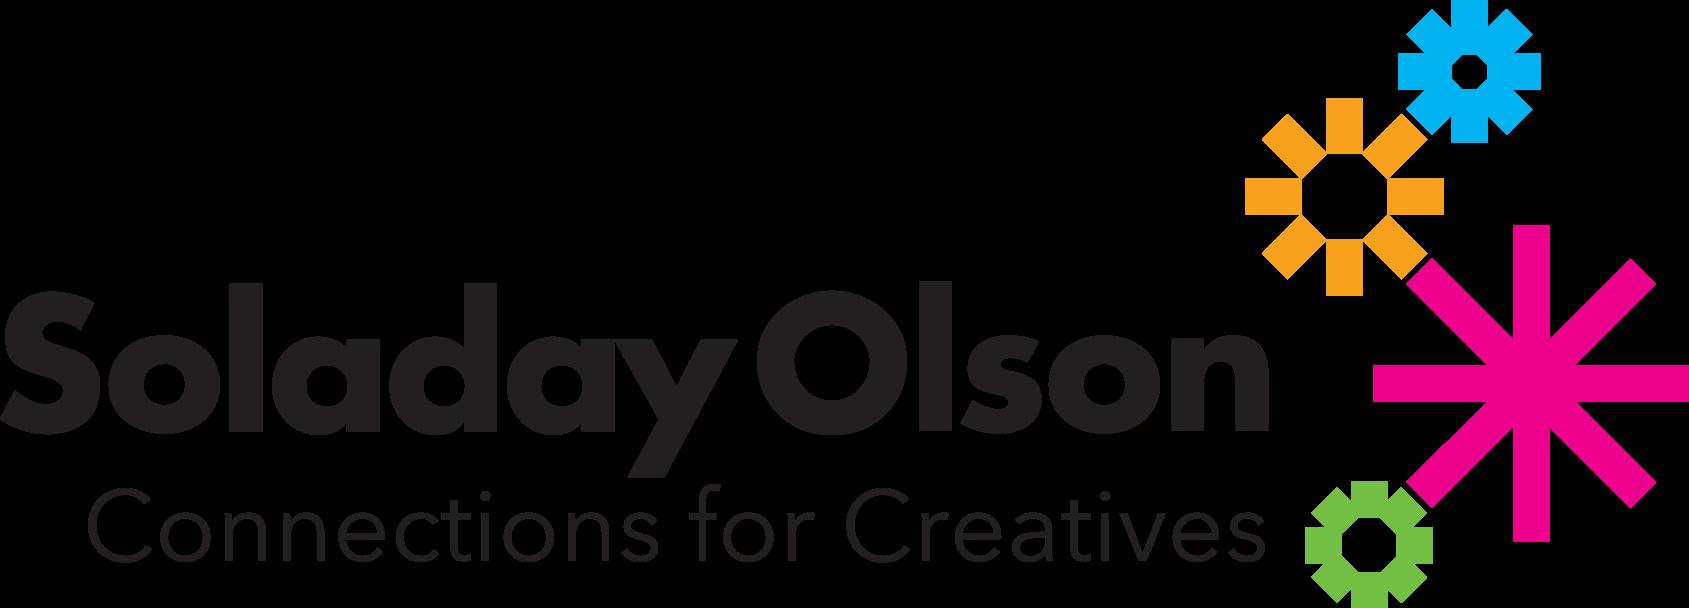 Soladay Olson